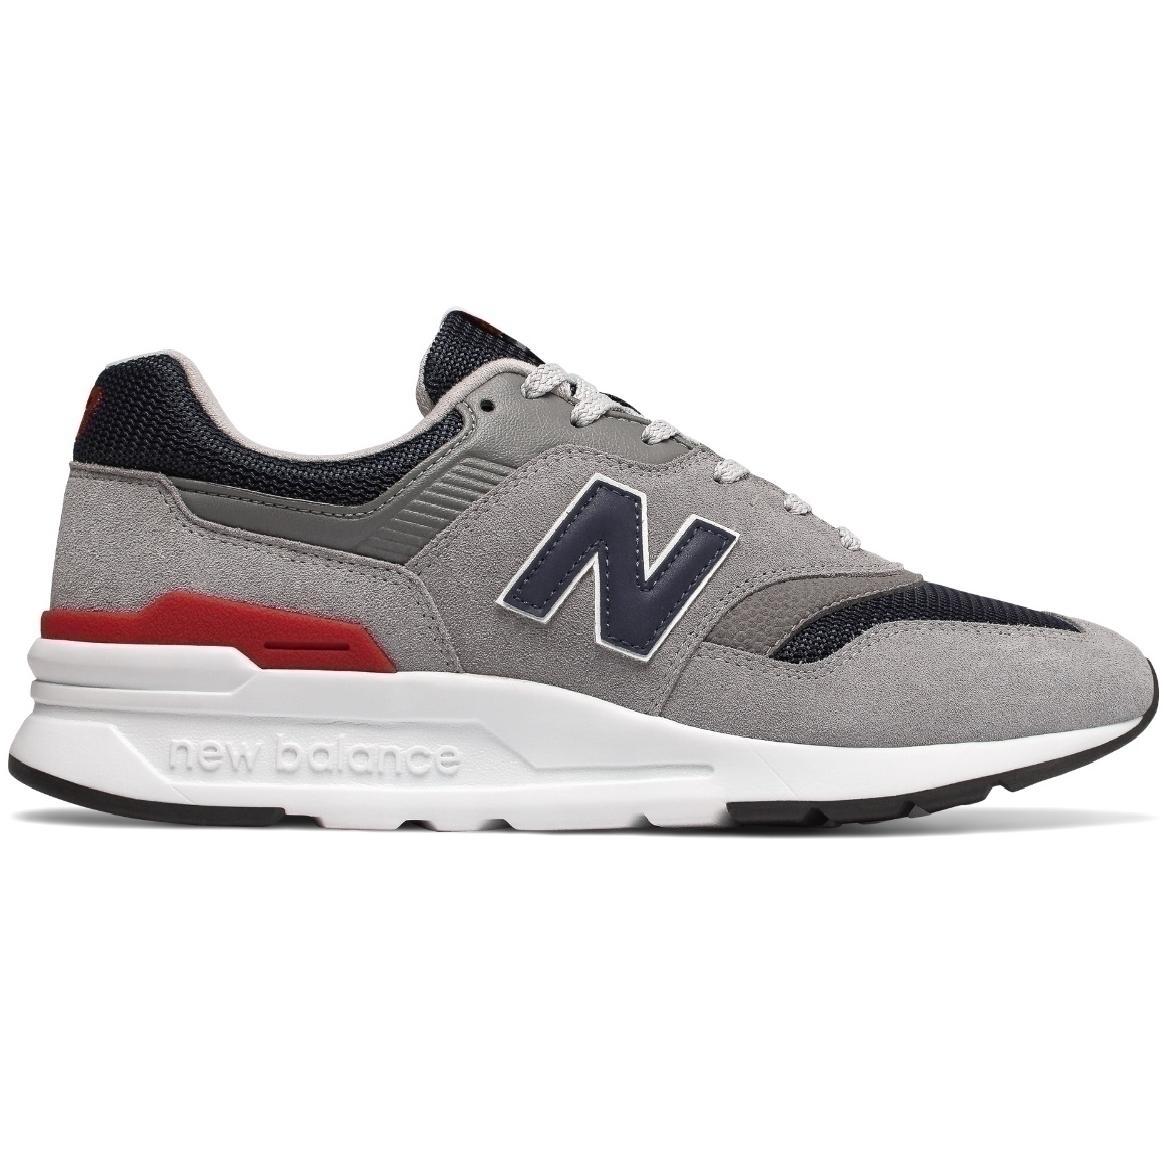 New Balance CM 997 Sneaker